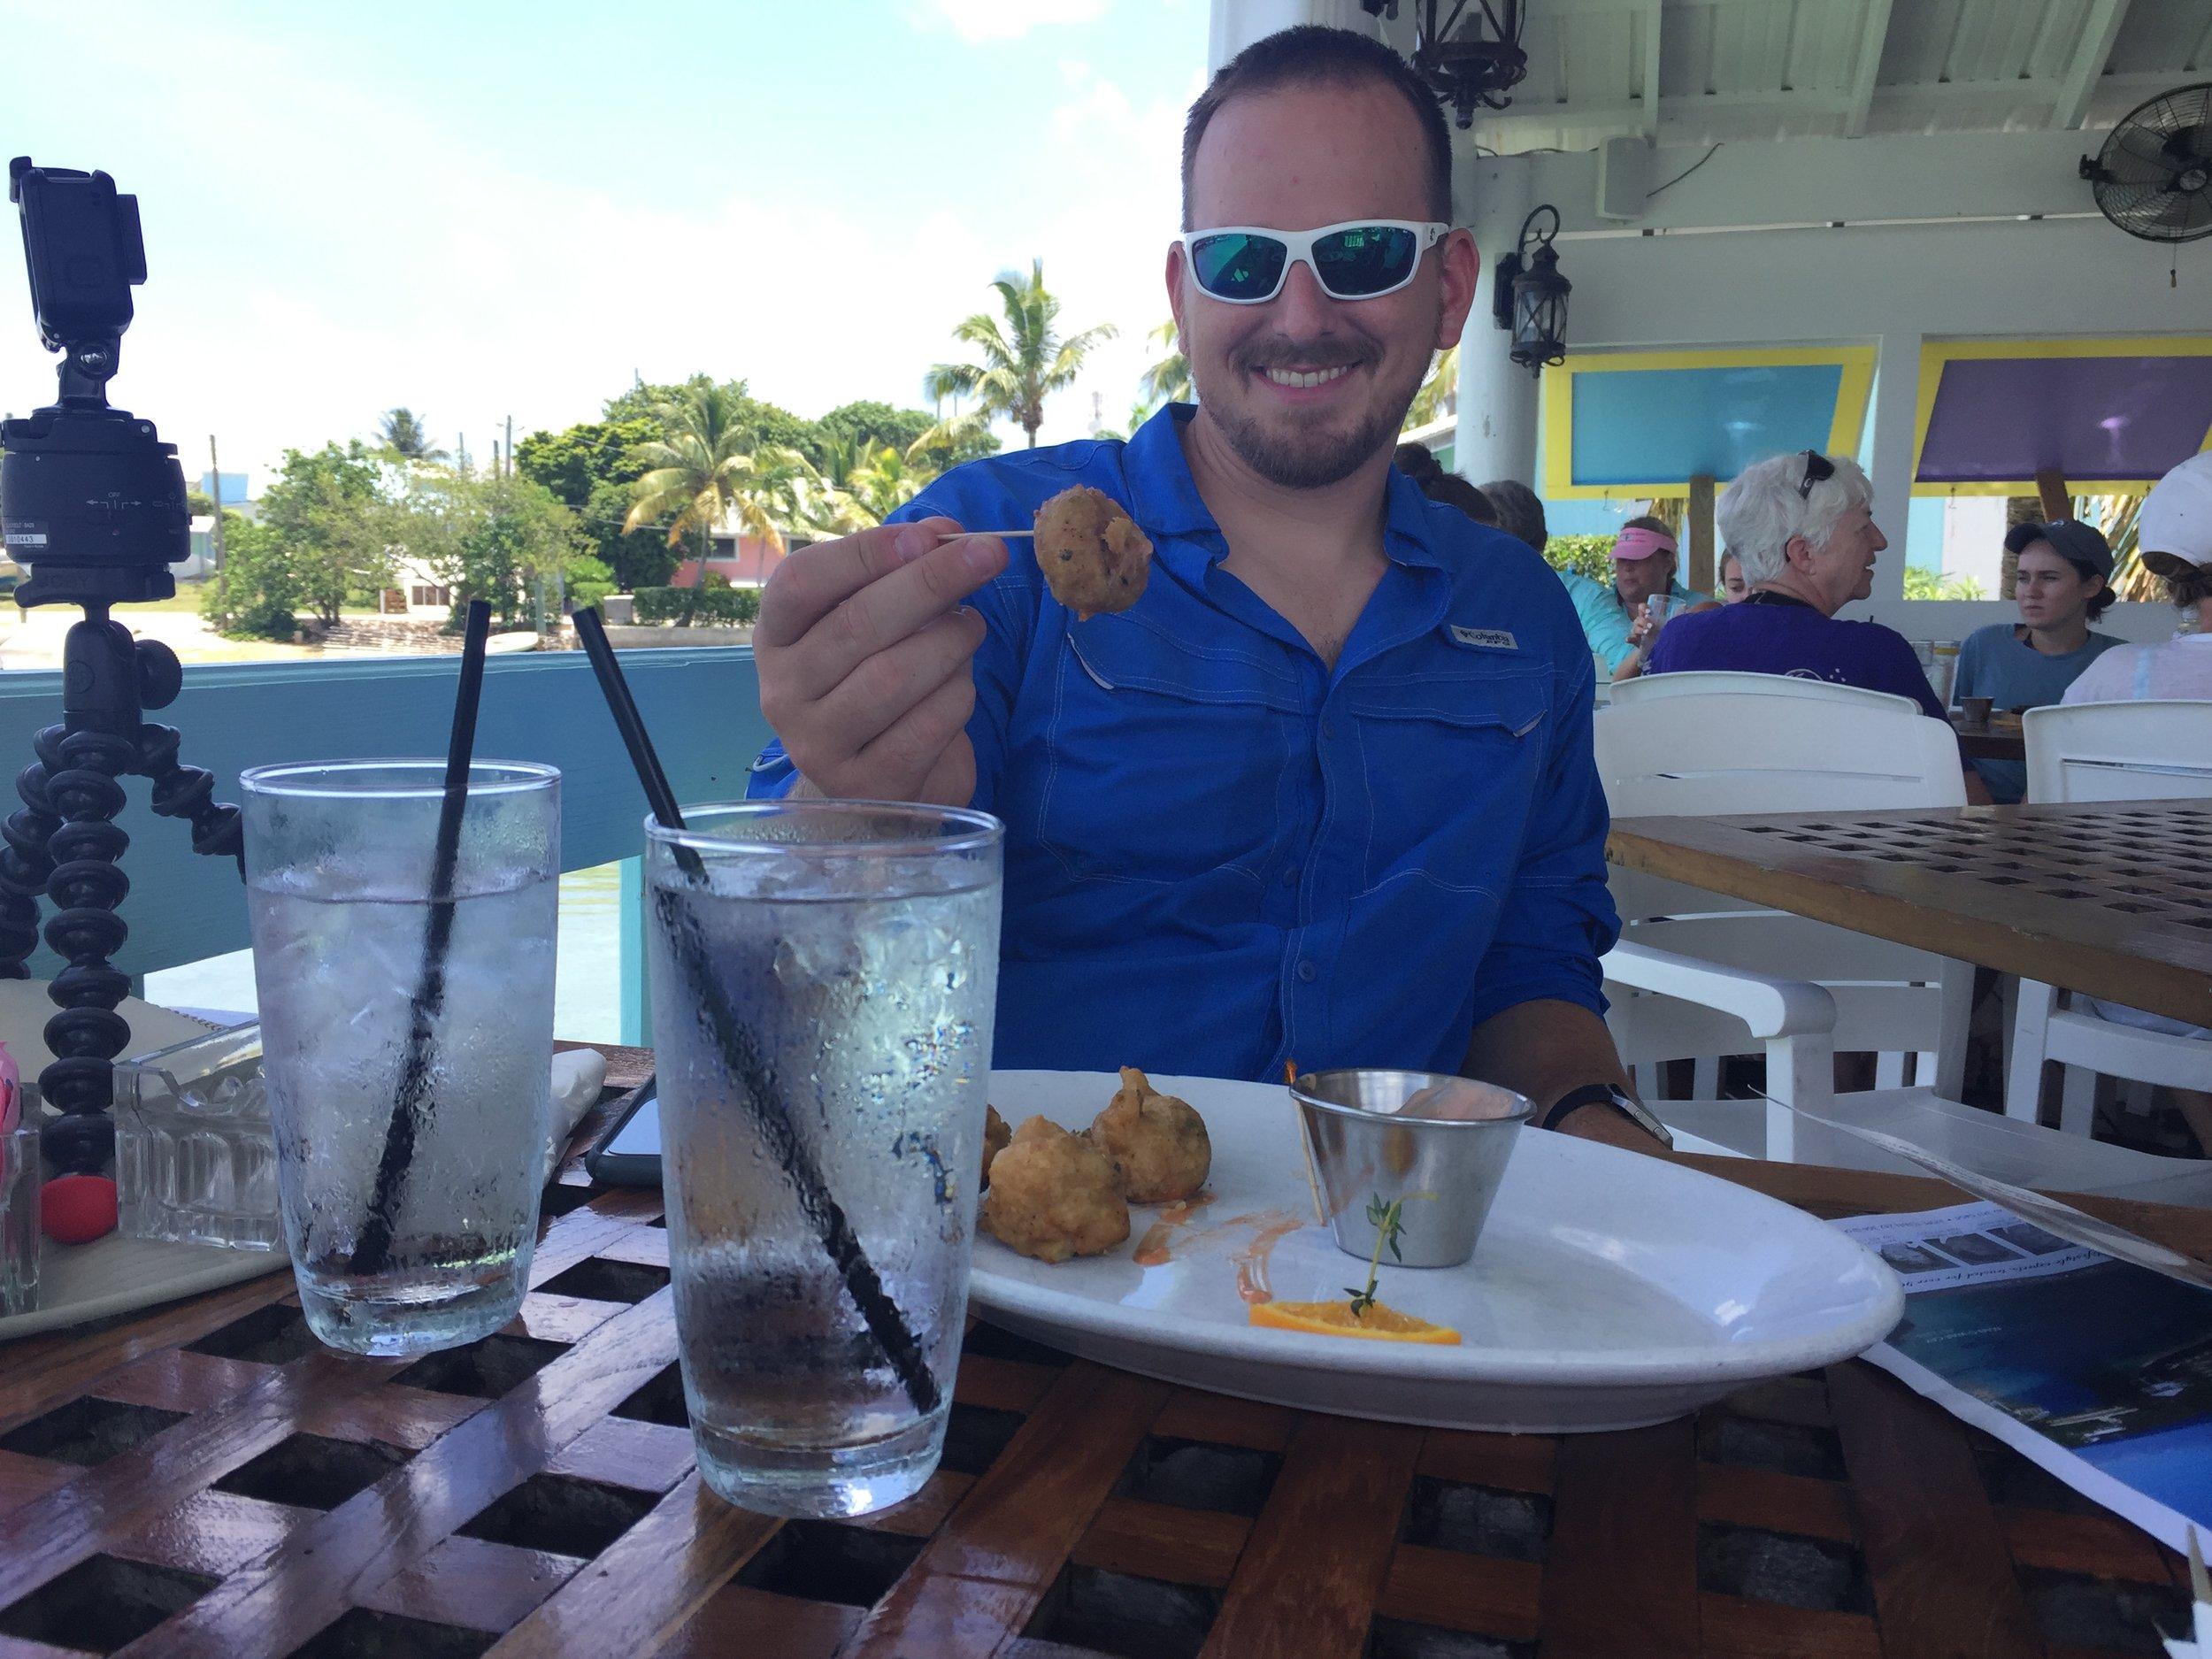 Man O War Dock and Dine